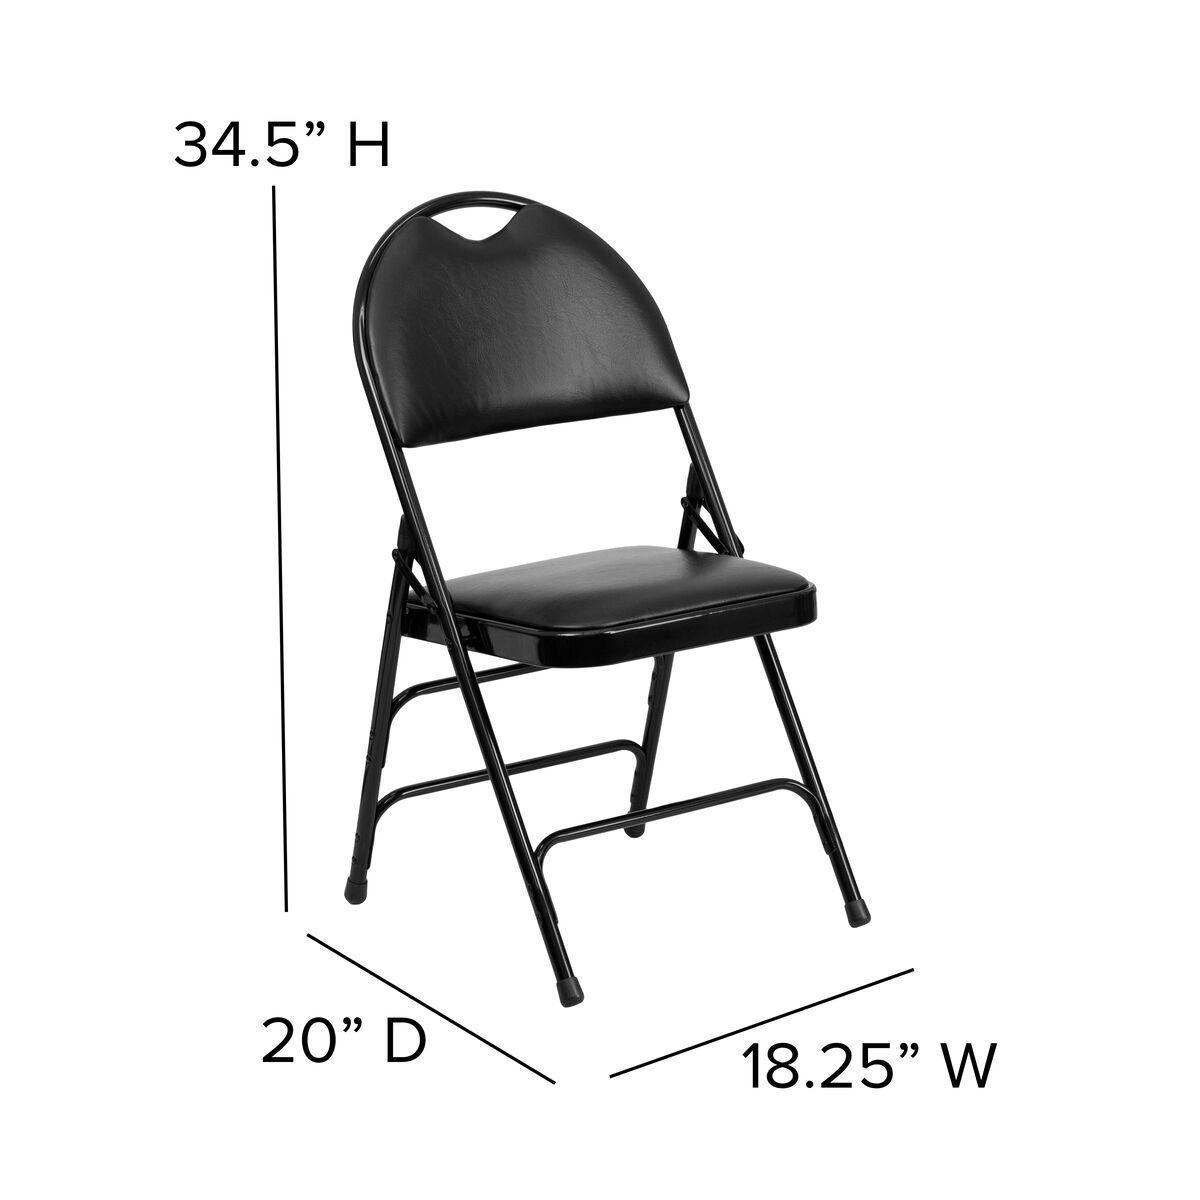 Our Hercules Series Ultra Premium Triple Braced Black Vinyl Metal Folding Chair With Easy